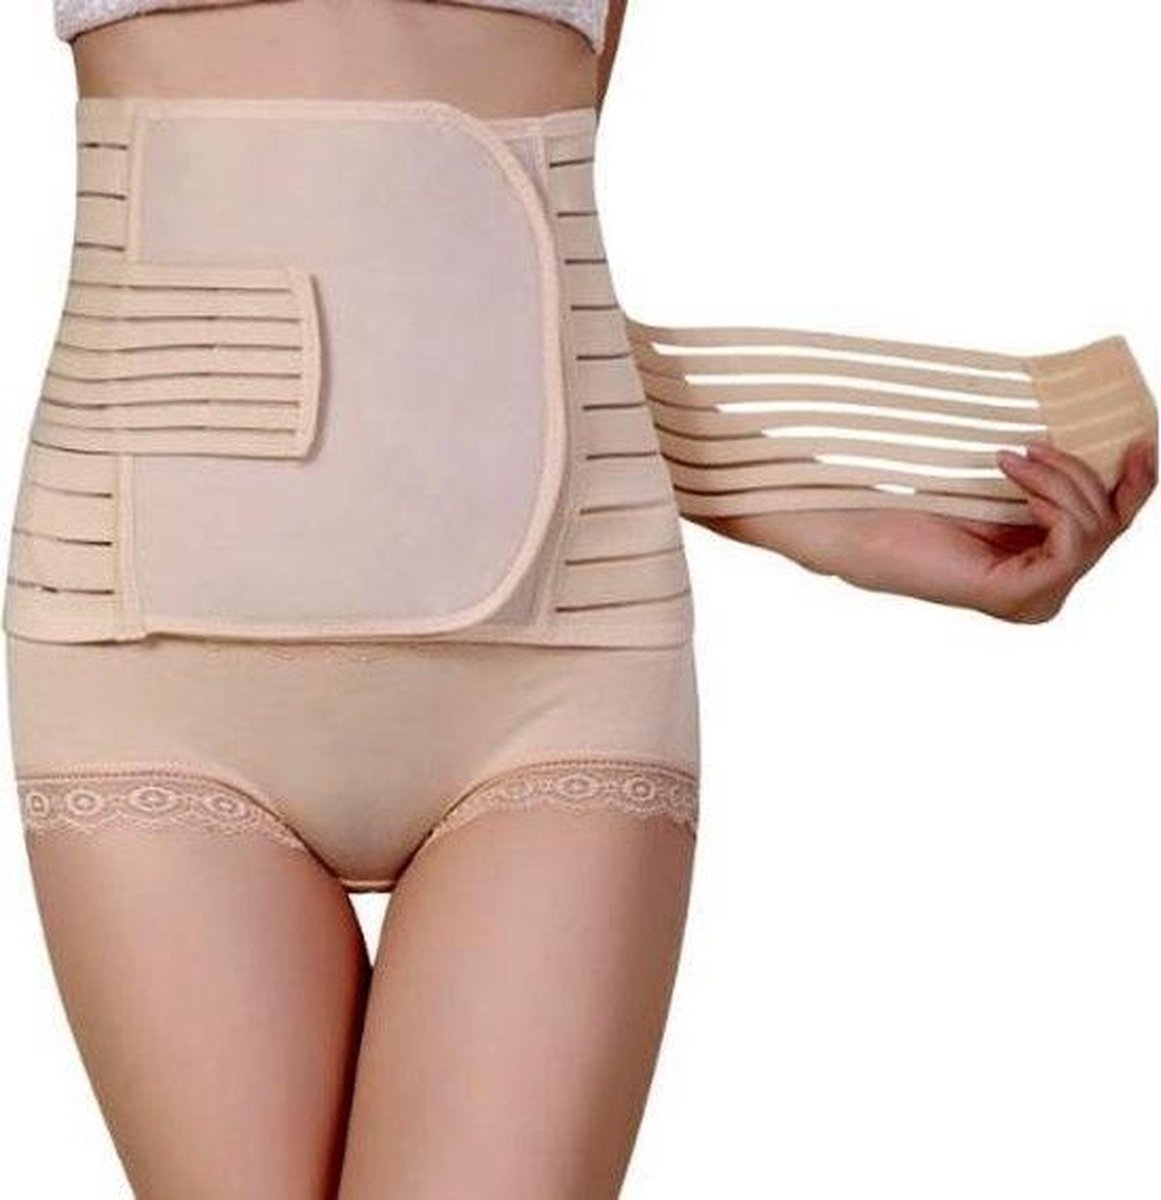 WiseGoods - Postpartum Zwangerschapsband - 3-in-1 Sluitband - Buikband Zwangerschap - Postnatale Slu